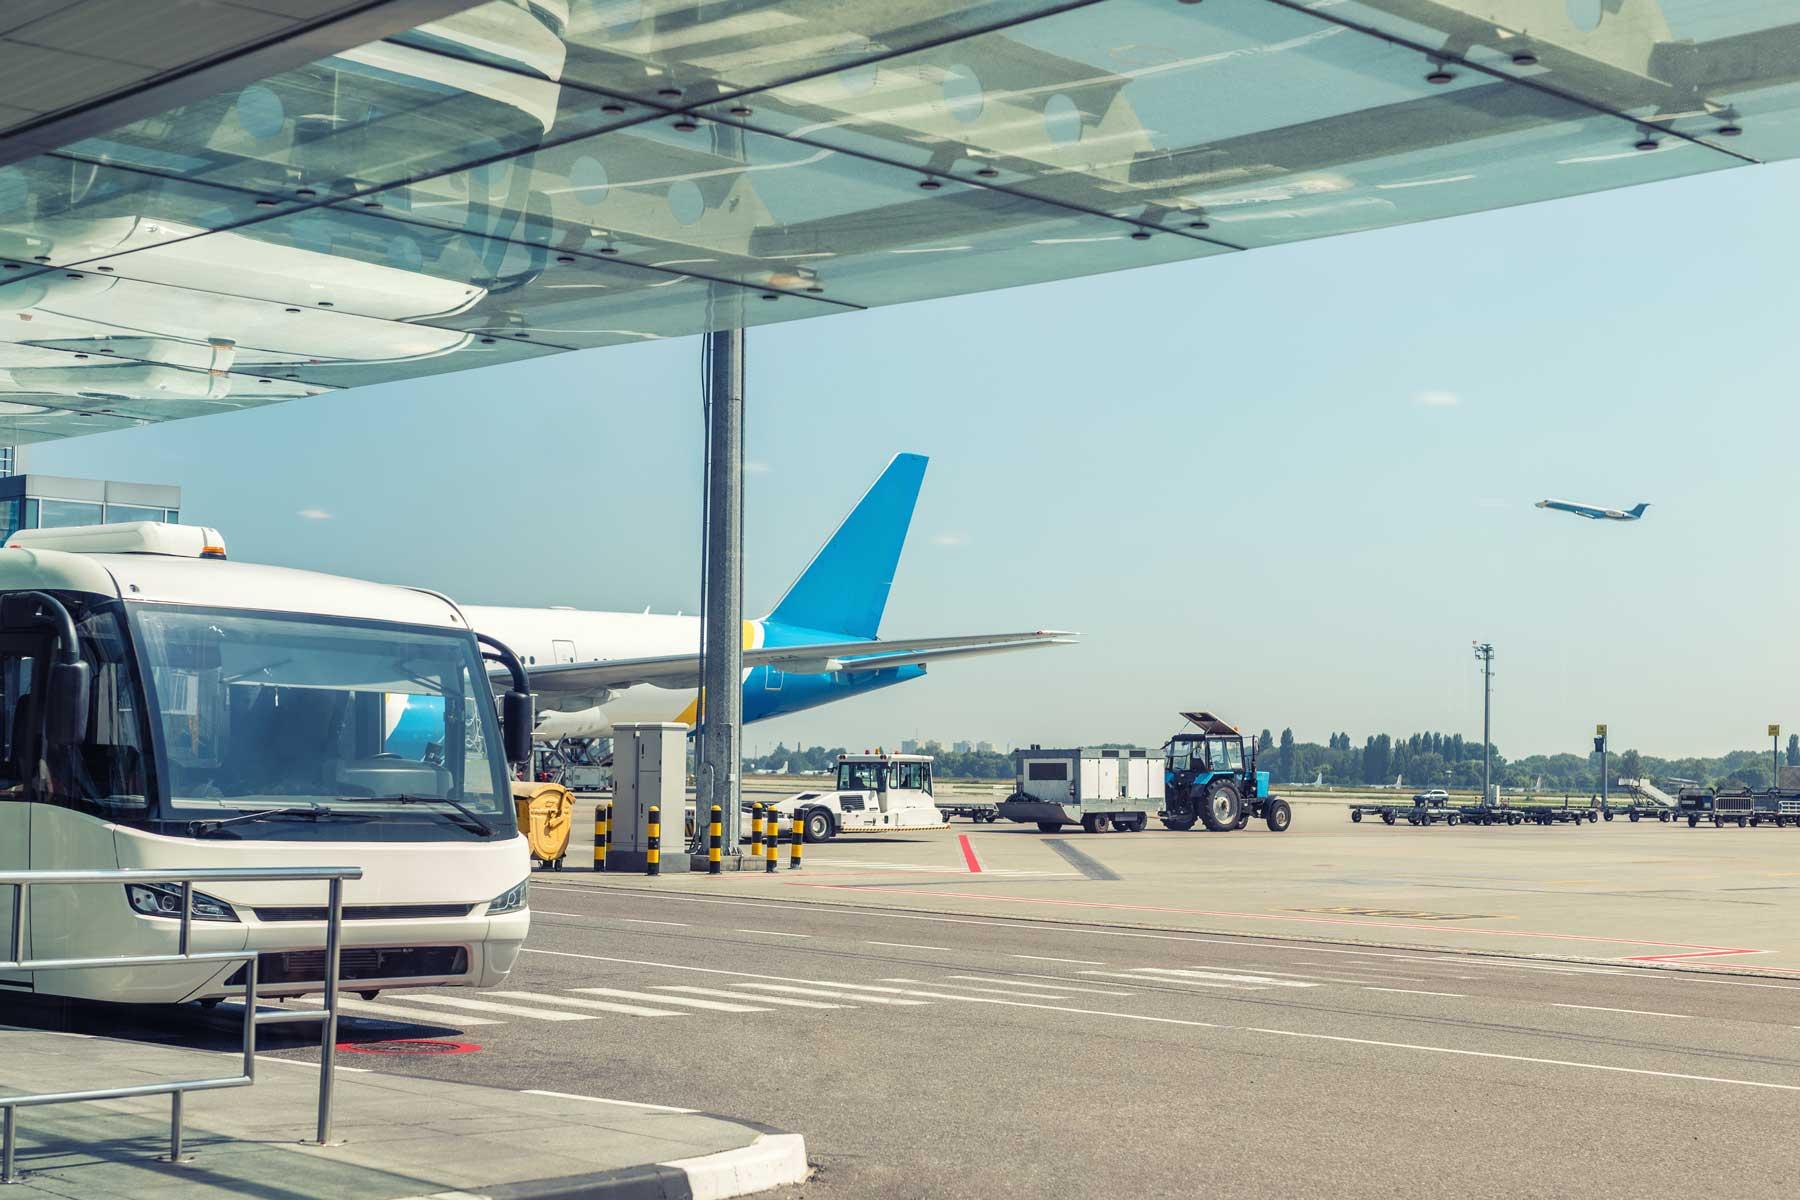 Airport Driving Simulator - developing multitasking skills